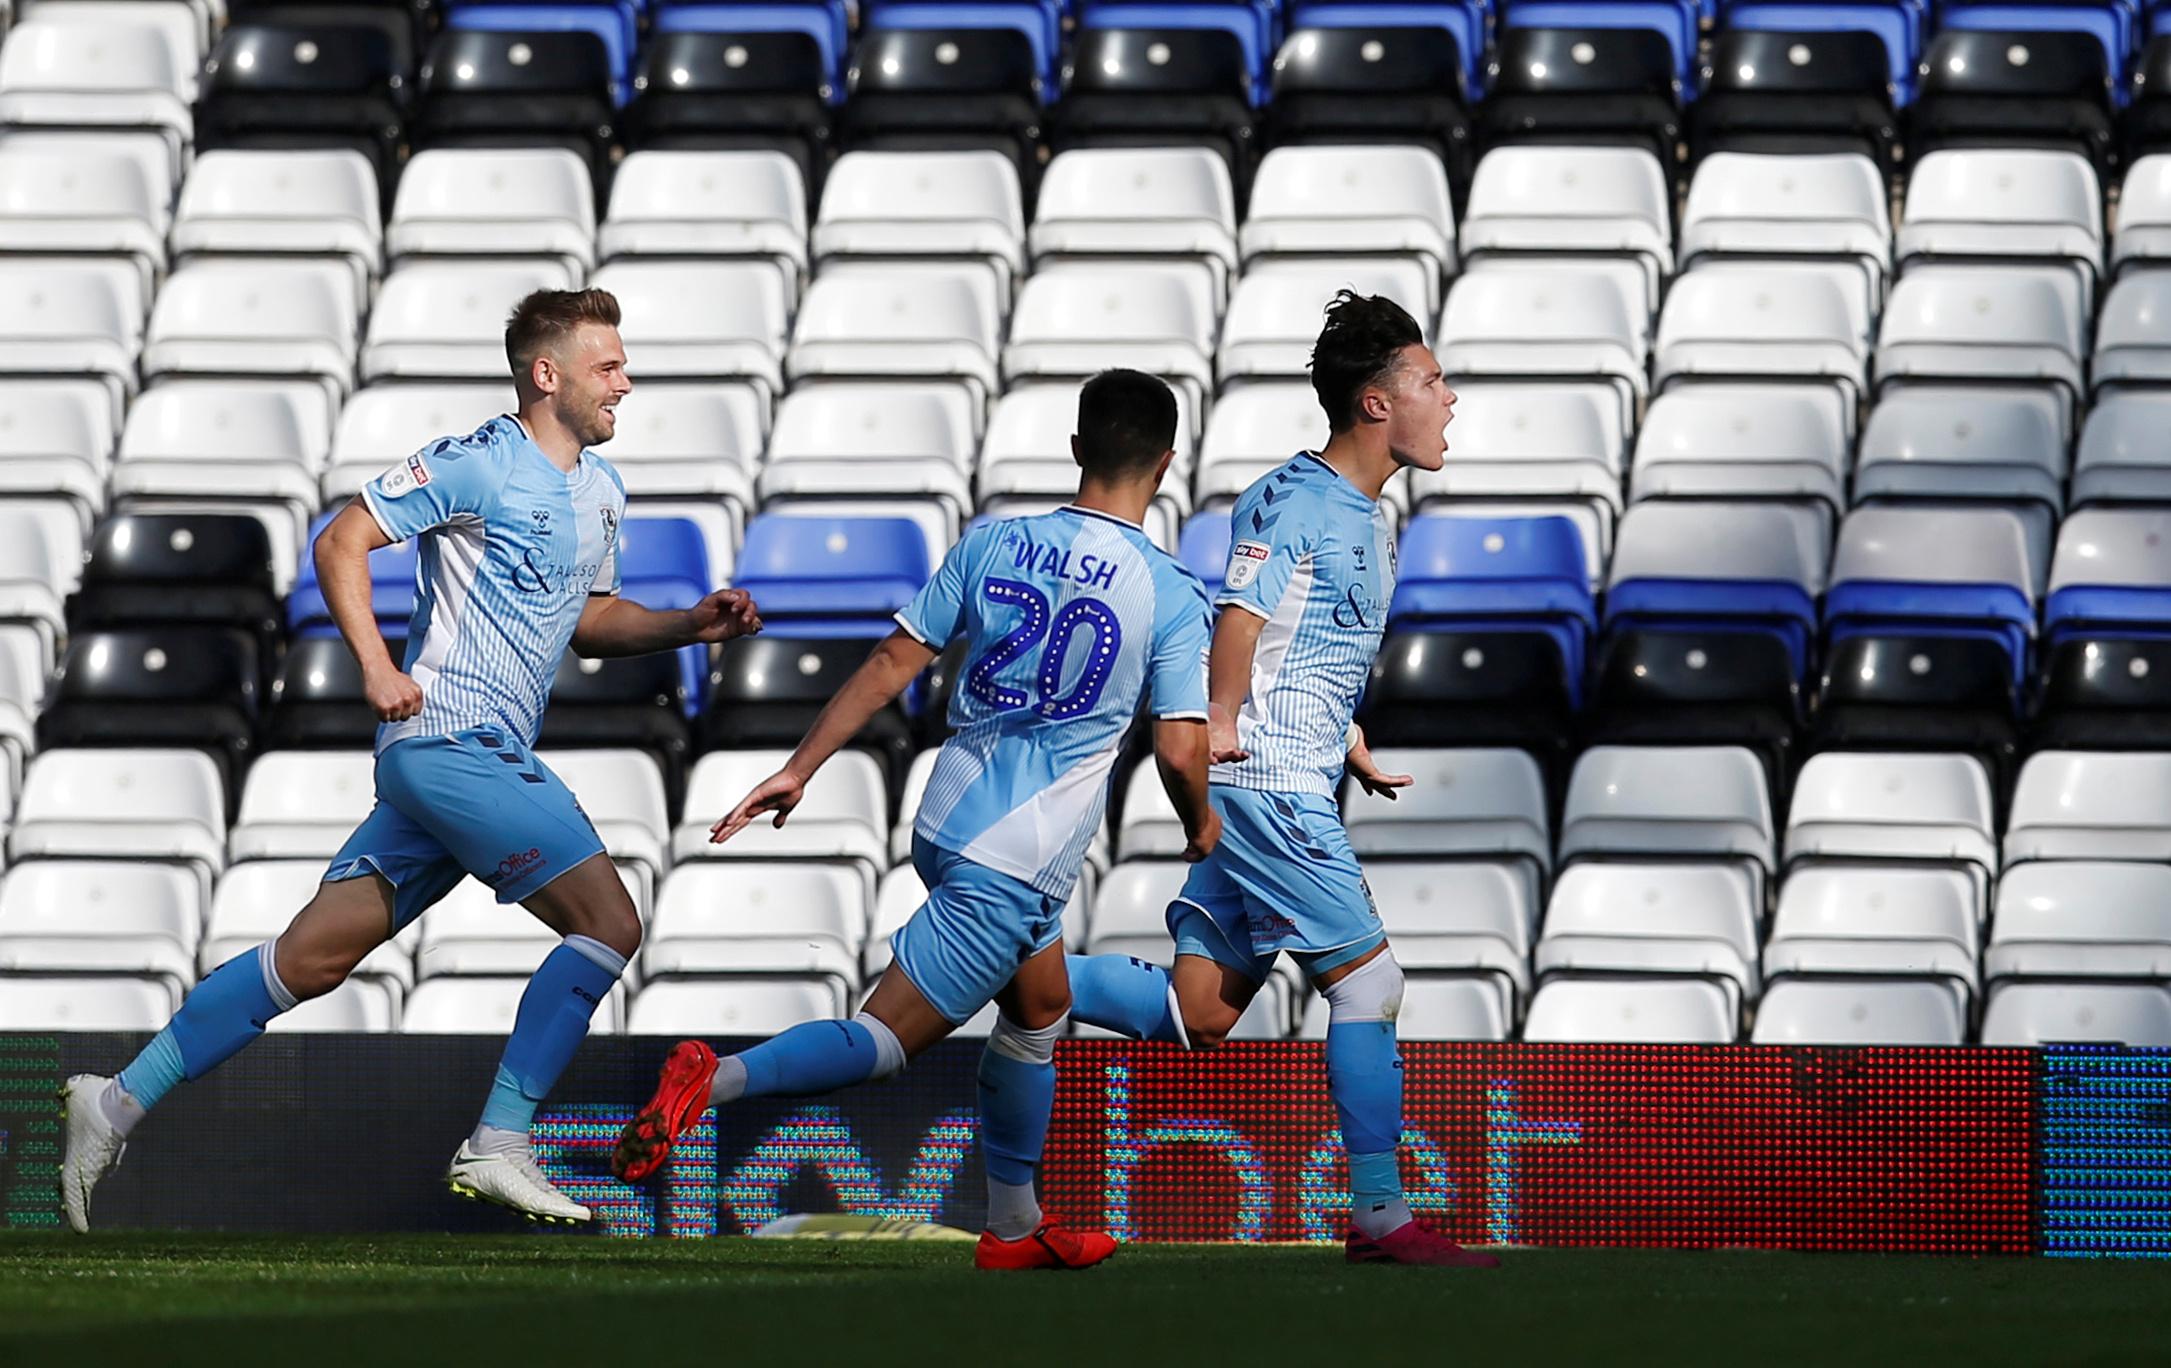 Coventry City Salaries 2020